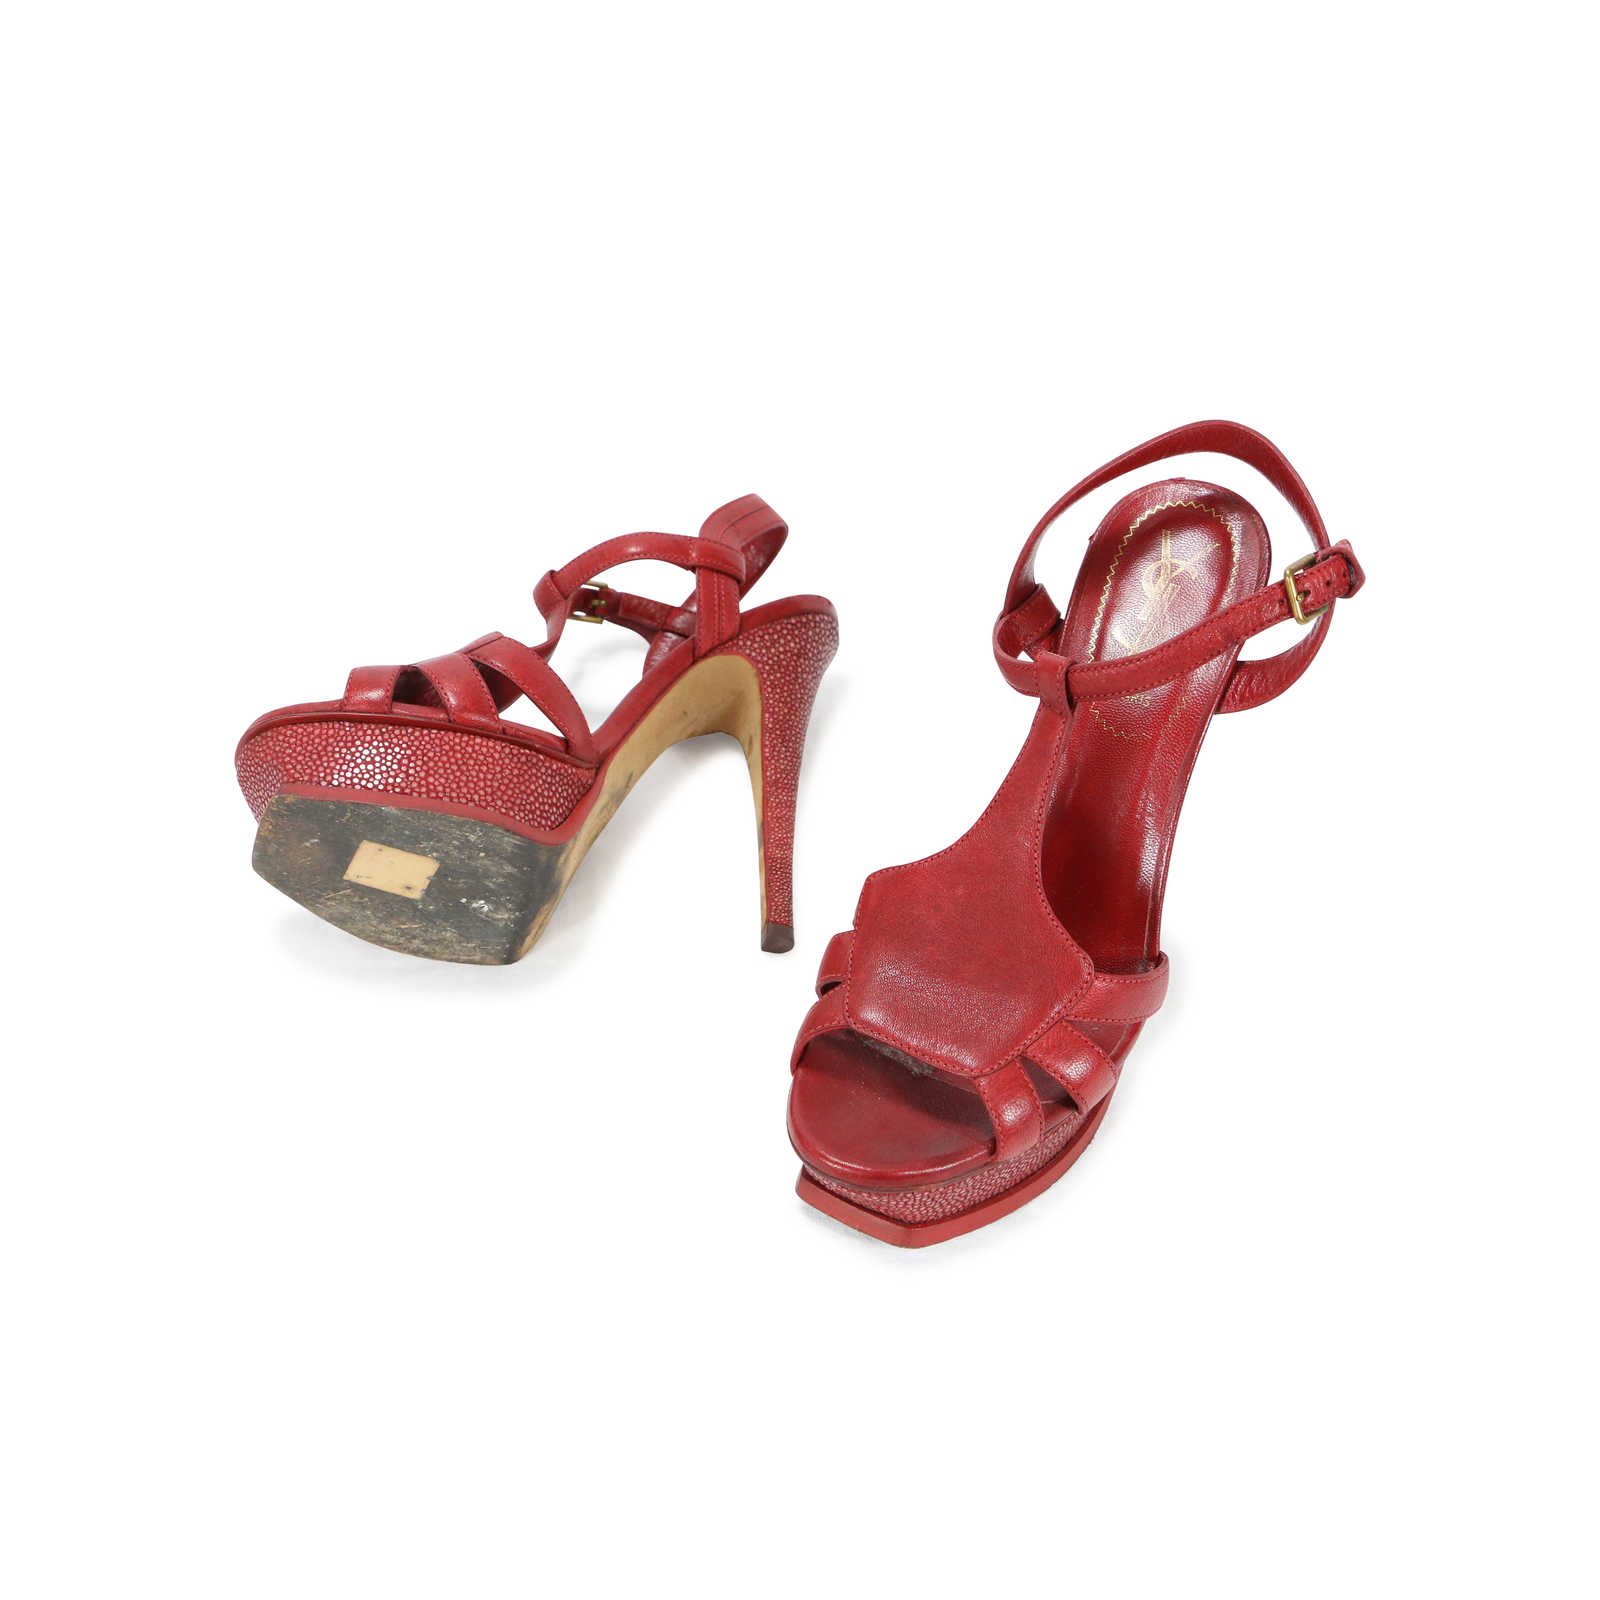 d2f53f989f ... Authentic Second Hand Yves Saint Laurent Stingray Tribute 105 Sandals  (PSS-088-00032 ...